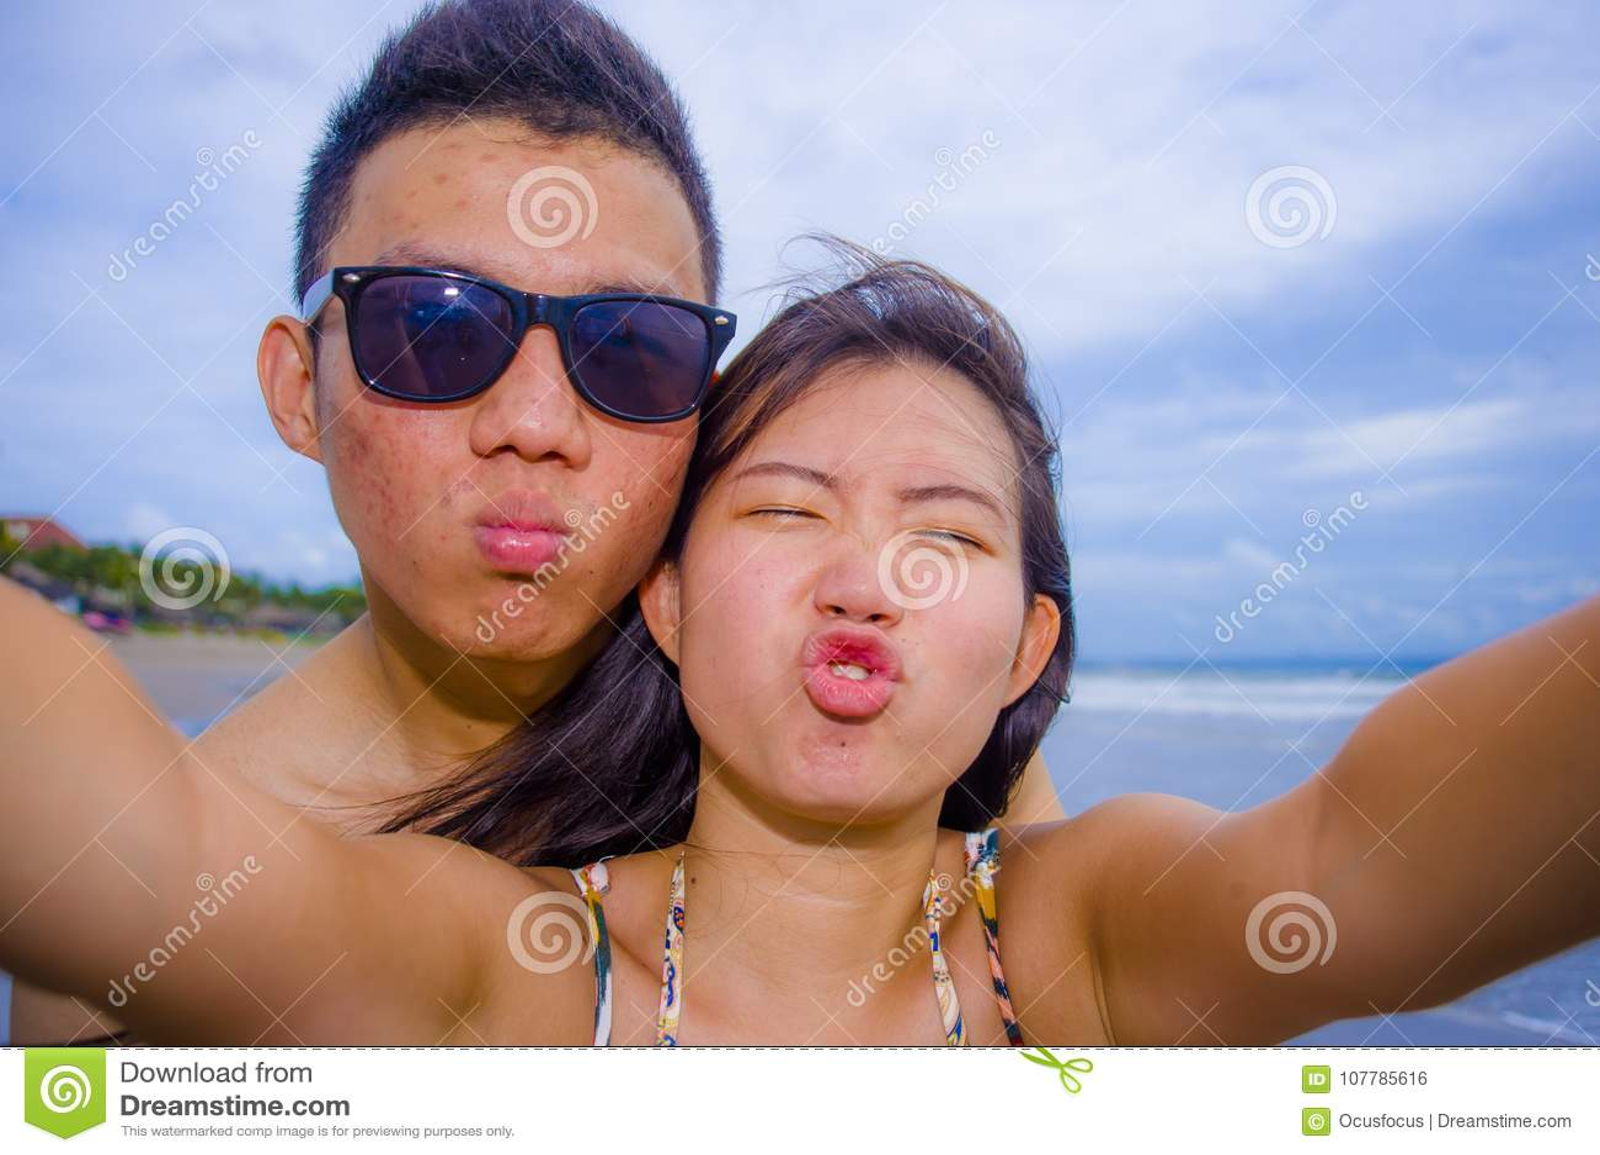 asiatique Guy datant caucasien fille DotA 2 matchmaking solo